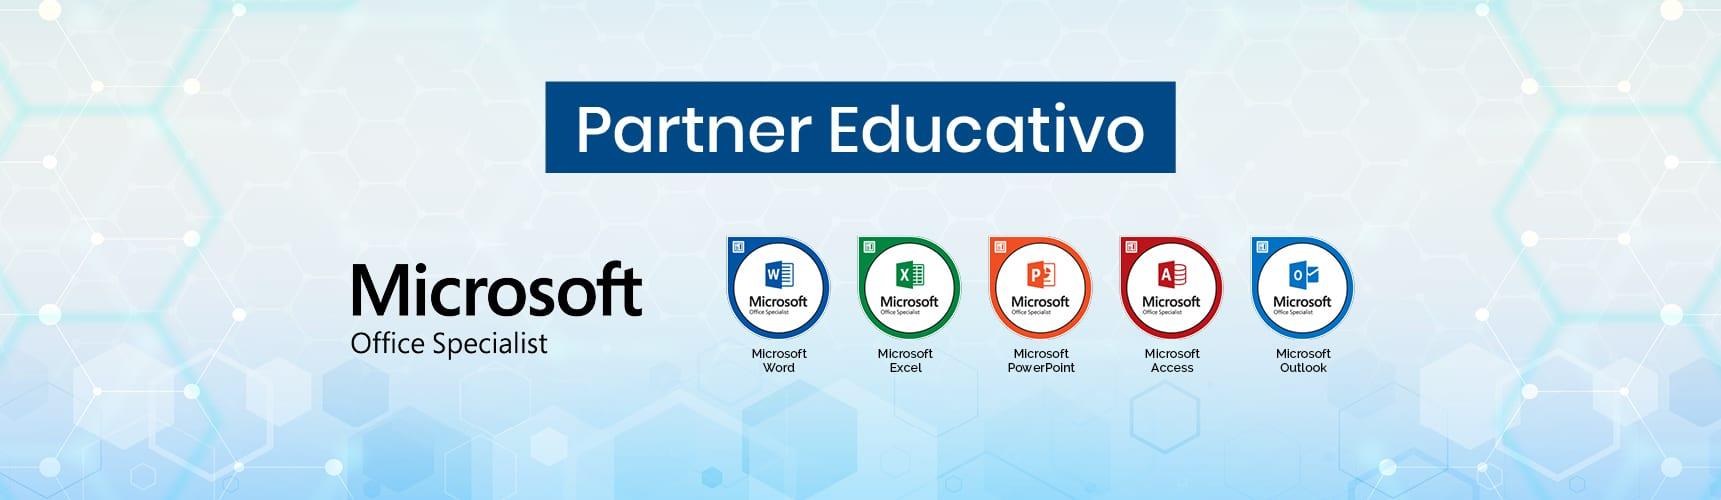 Partners Educativos